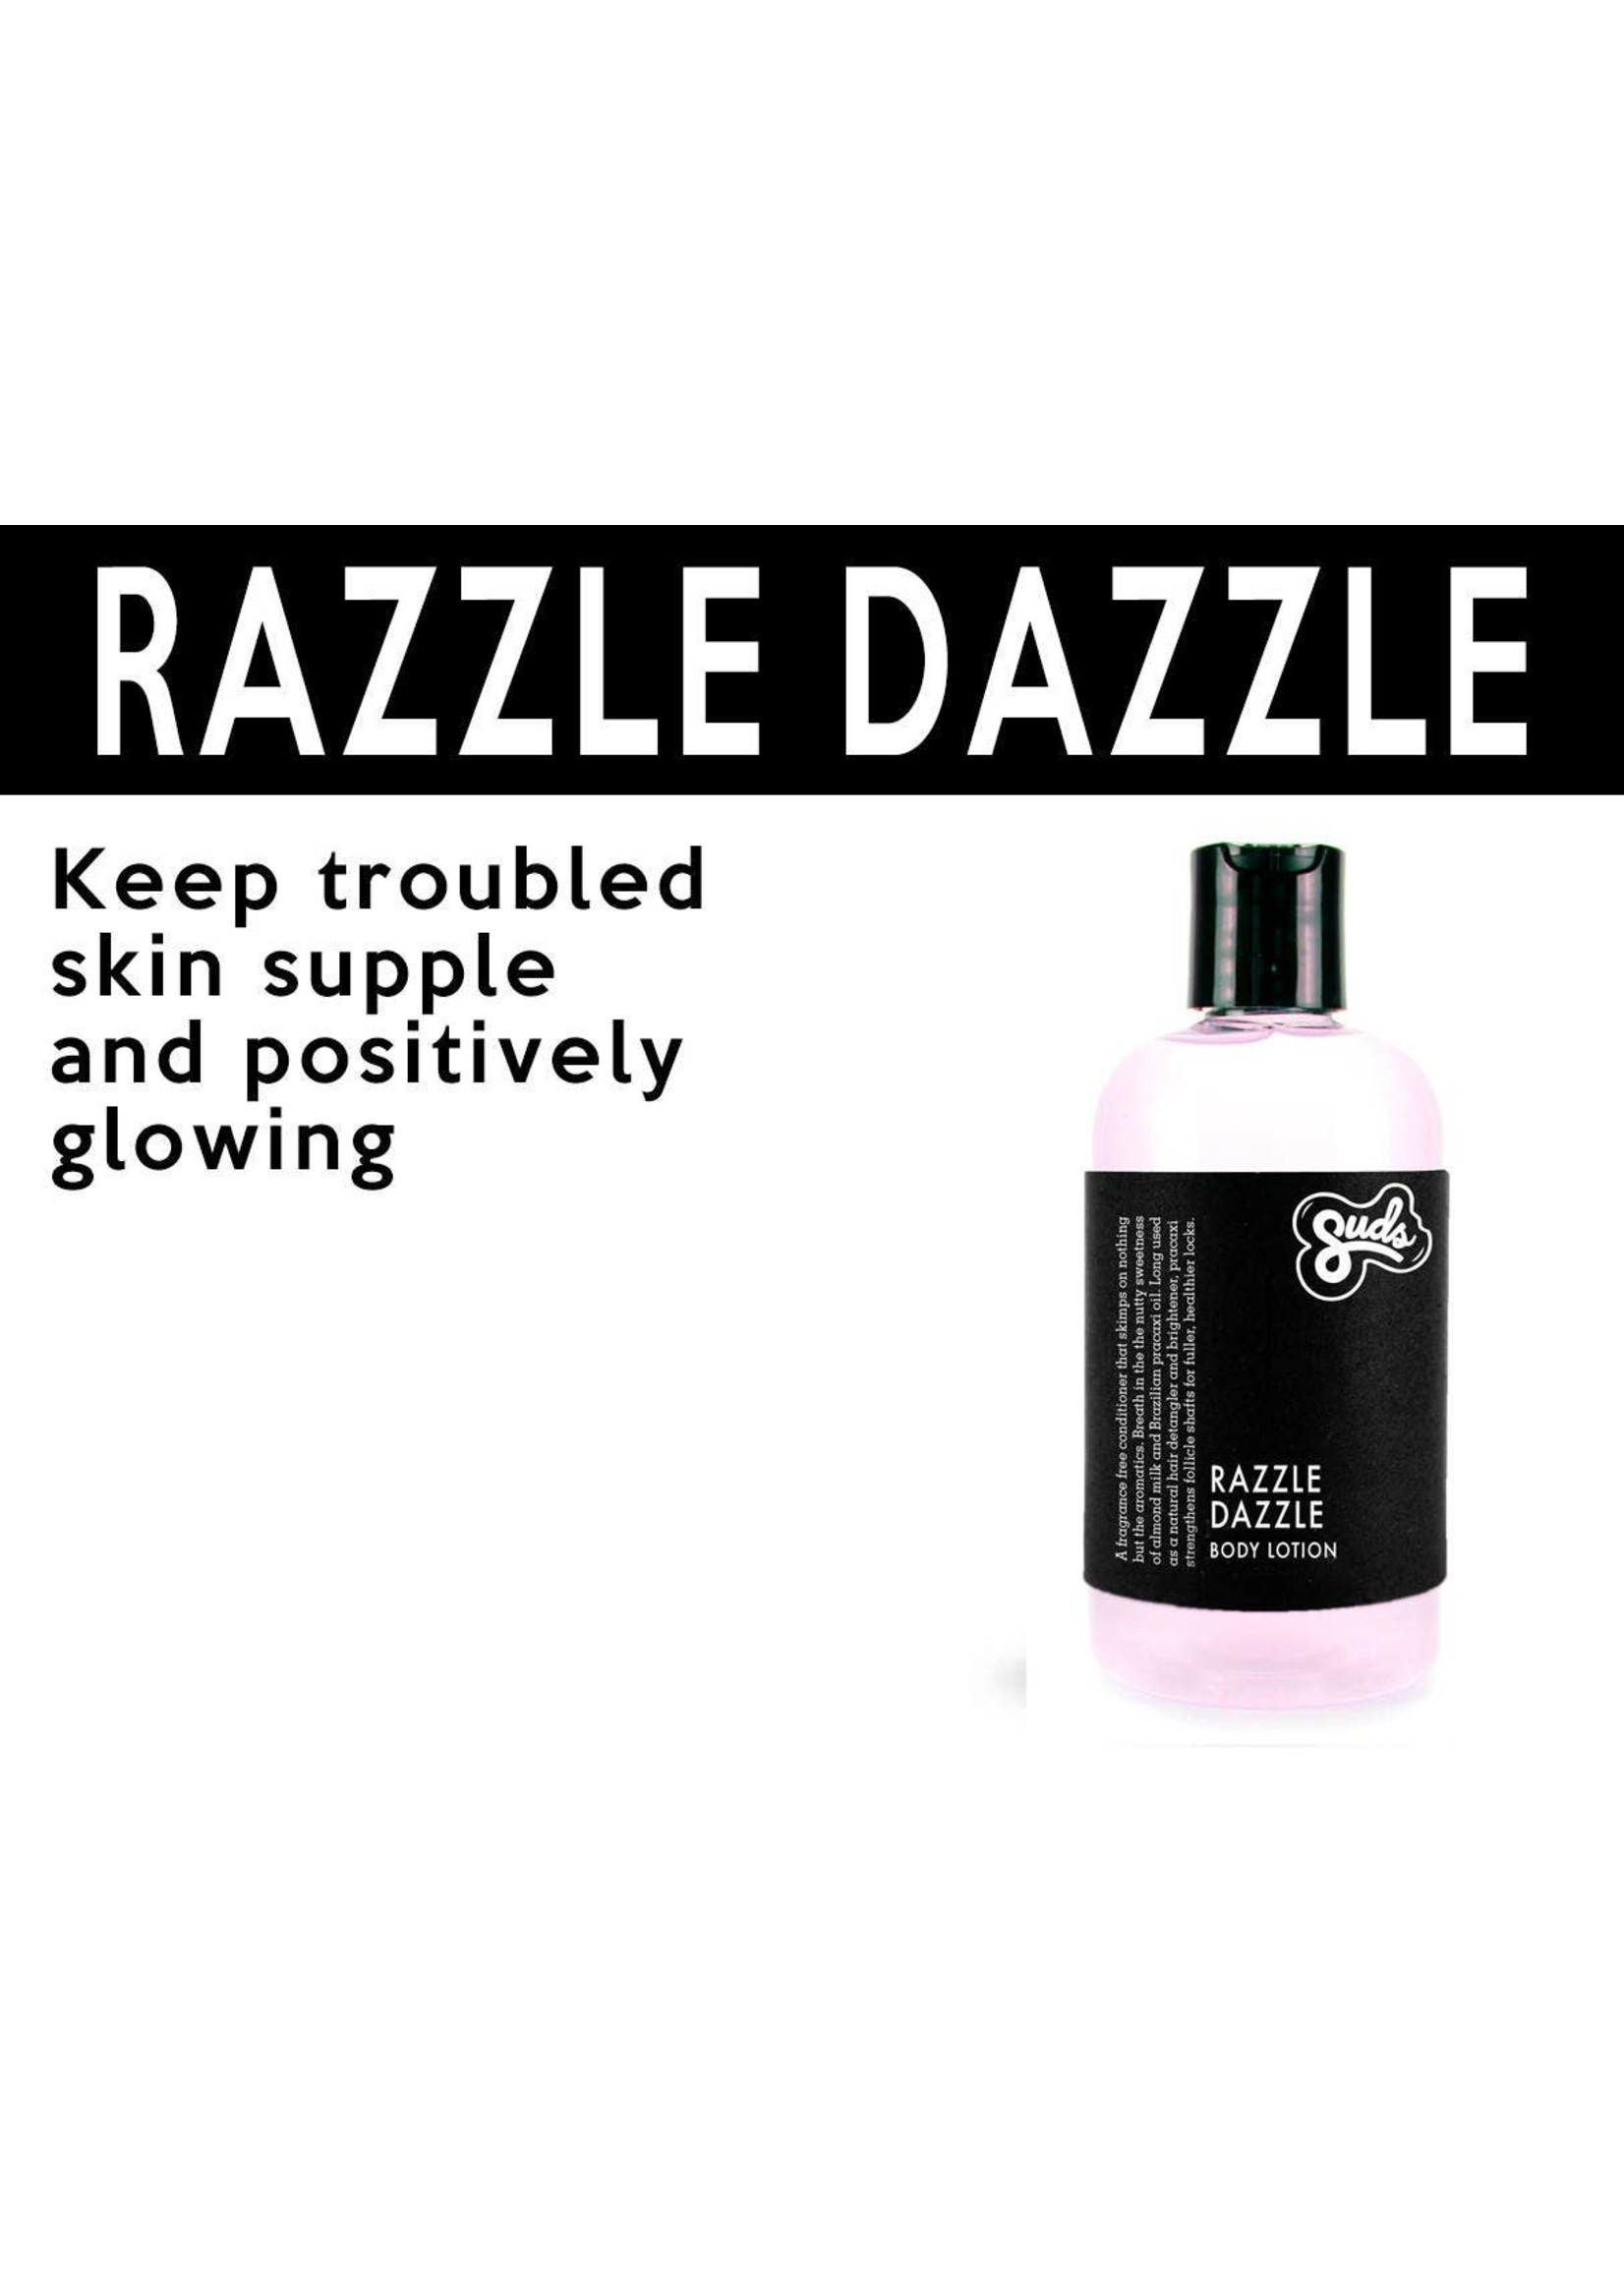 Razzle Dazzle Body Lotion - 250ml